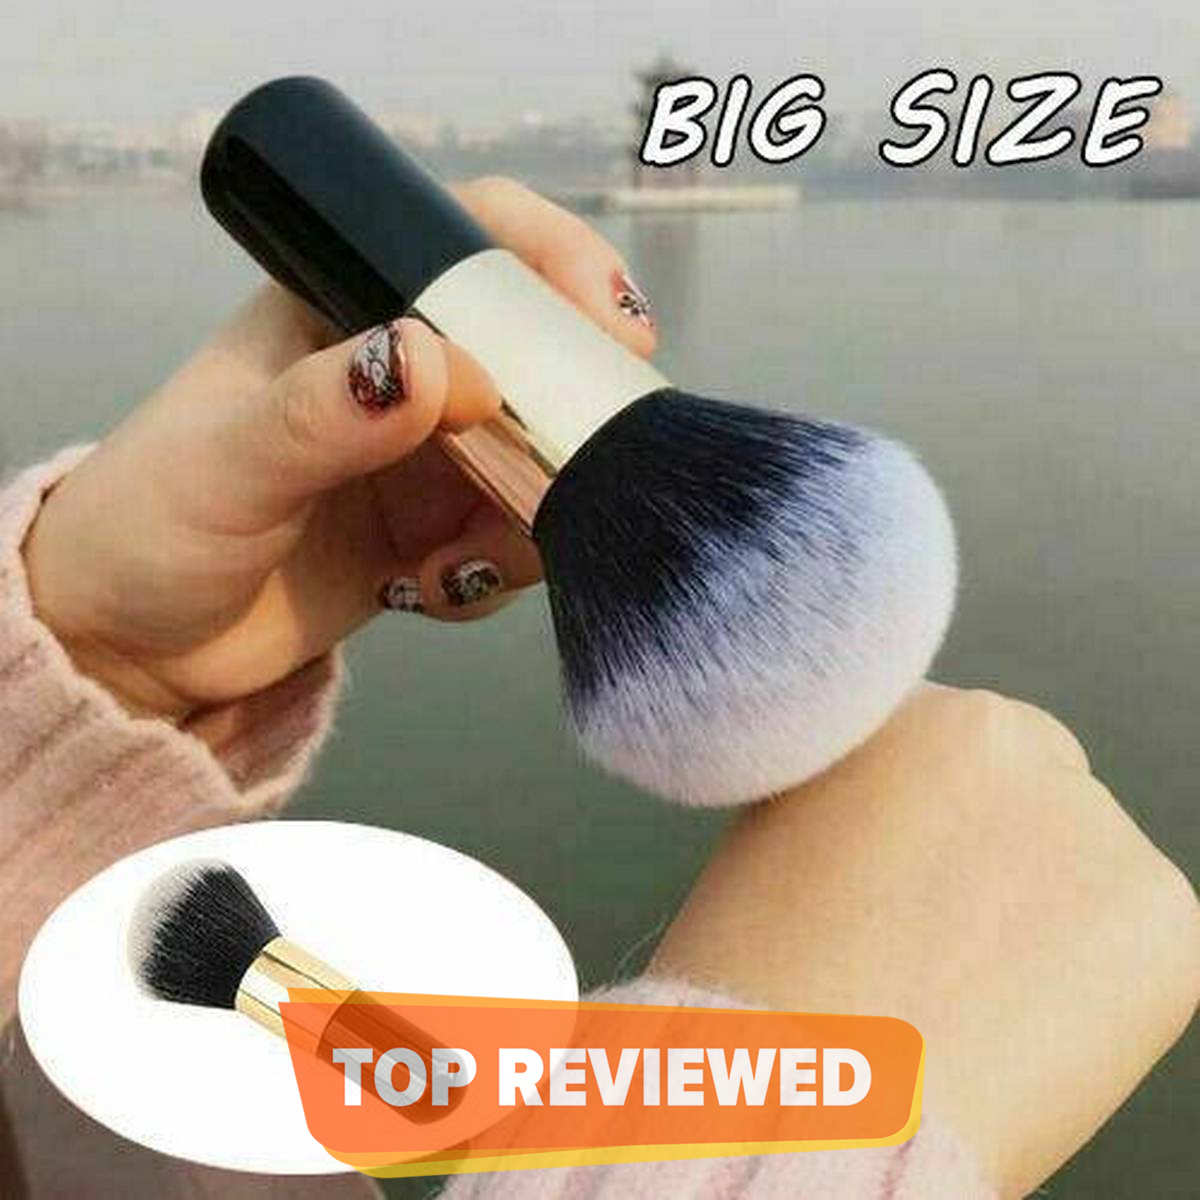 NEW!!! Professional Big Size Soft Makeup Brushes Beauty Powder Face Blush Brush Large Foundation Cosmetics Tools